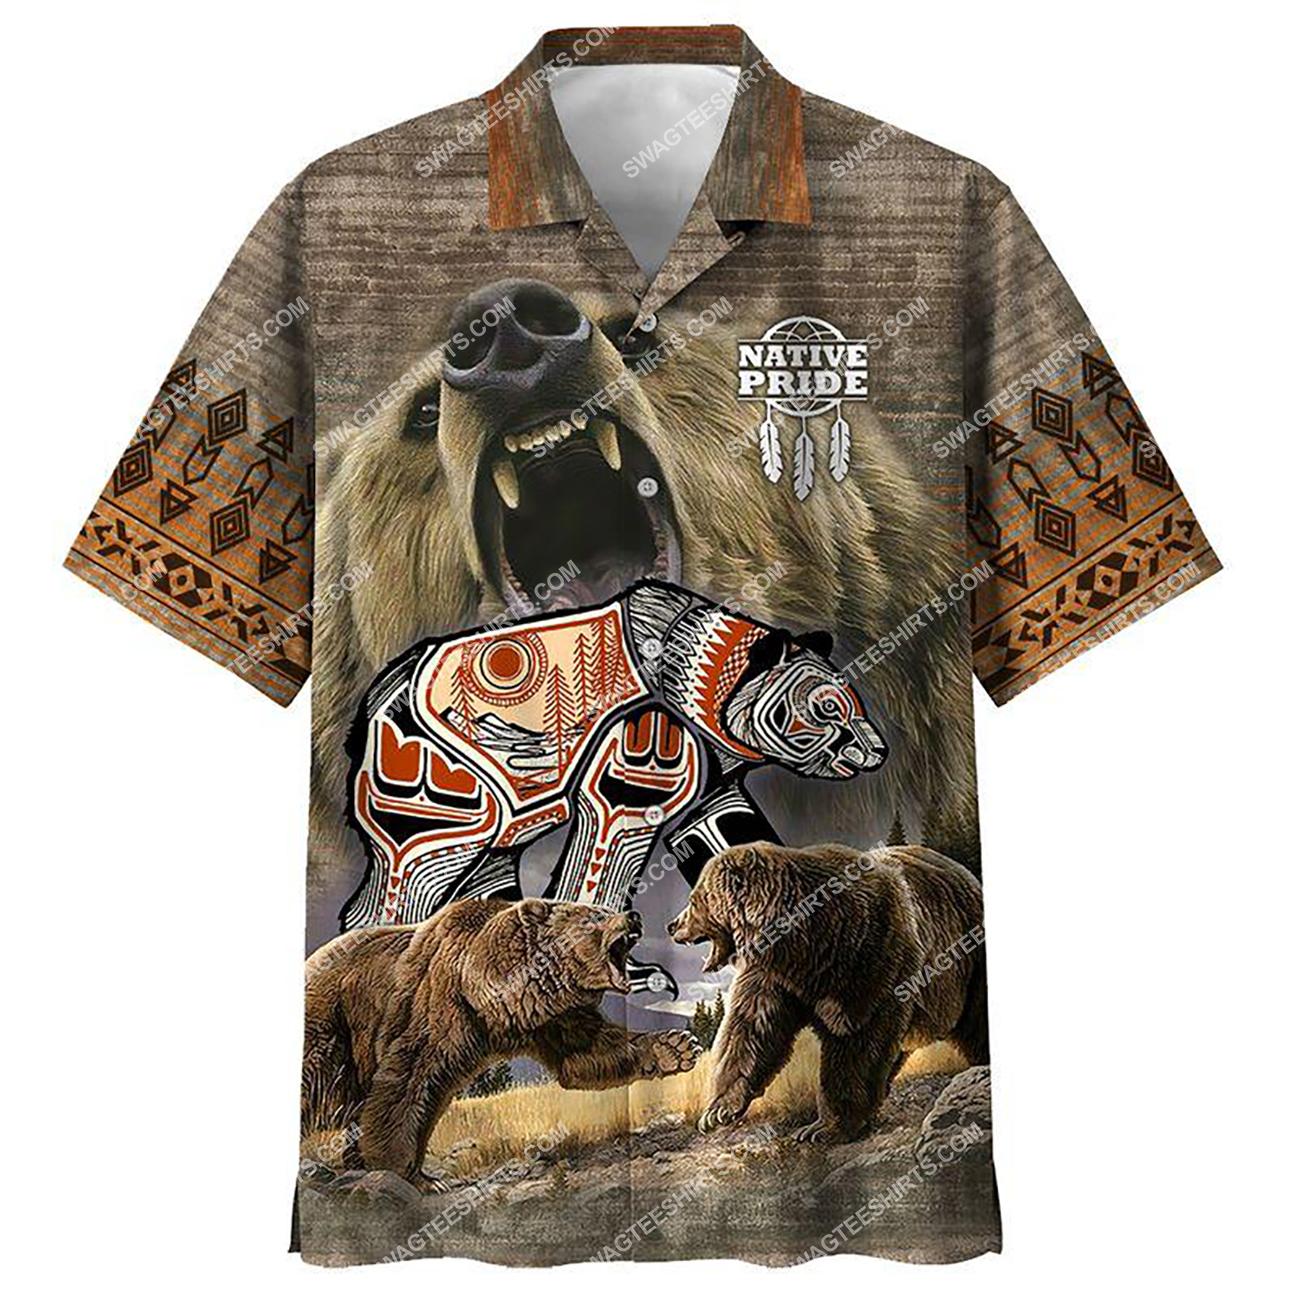 vintage native american native pride all over printed hawaiian shirt 1(1) - Copy